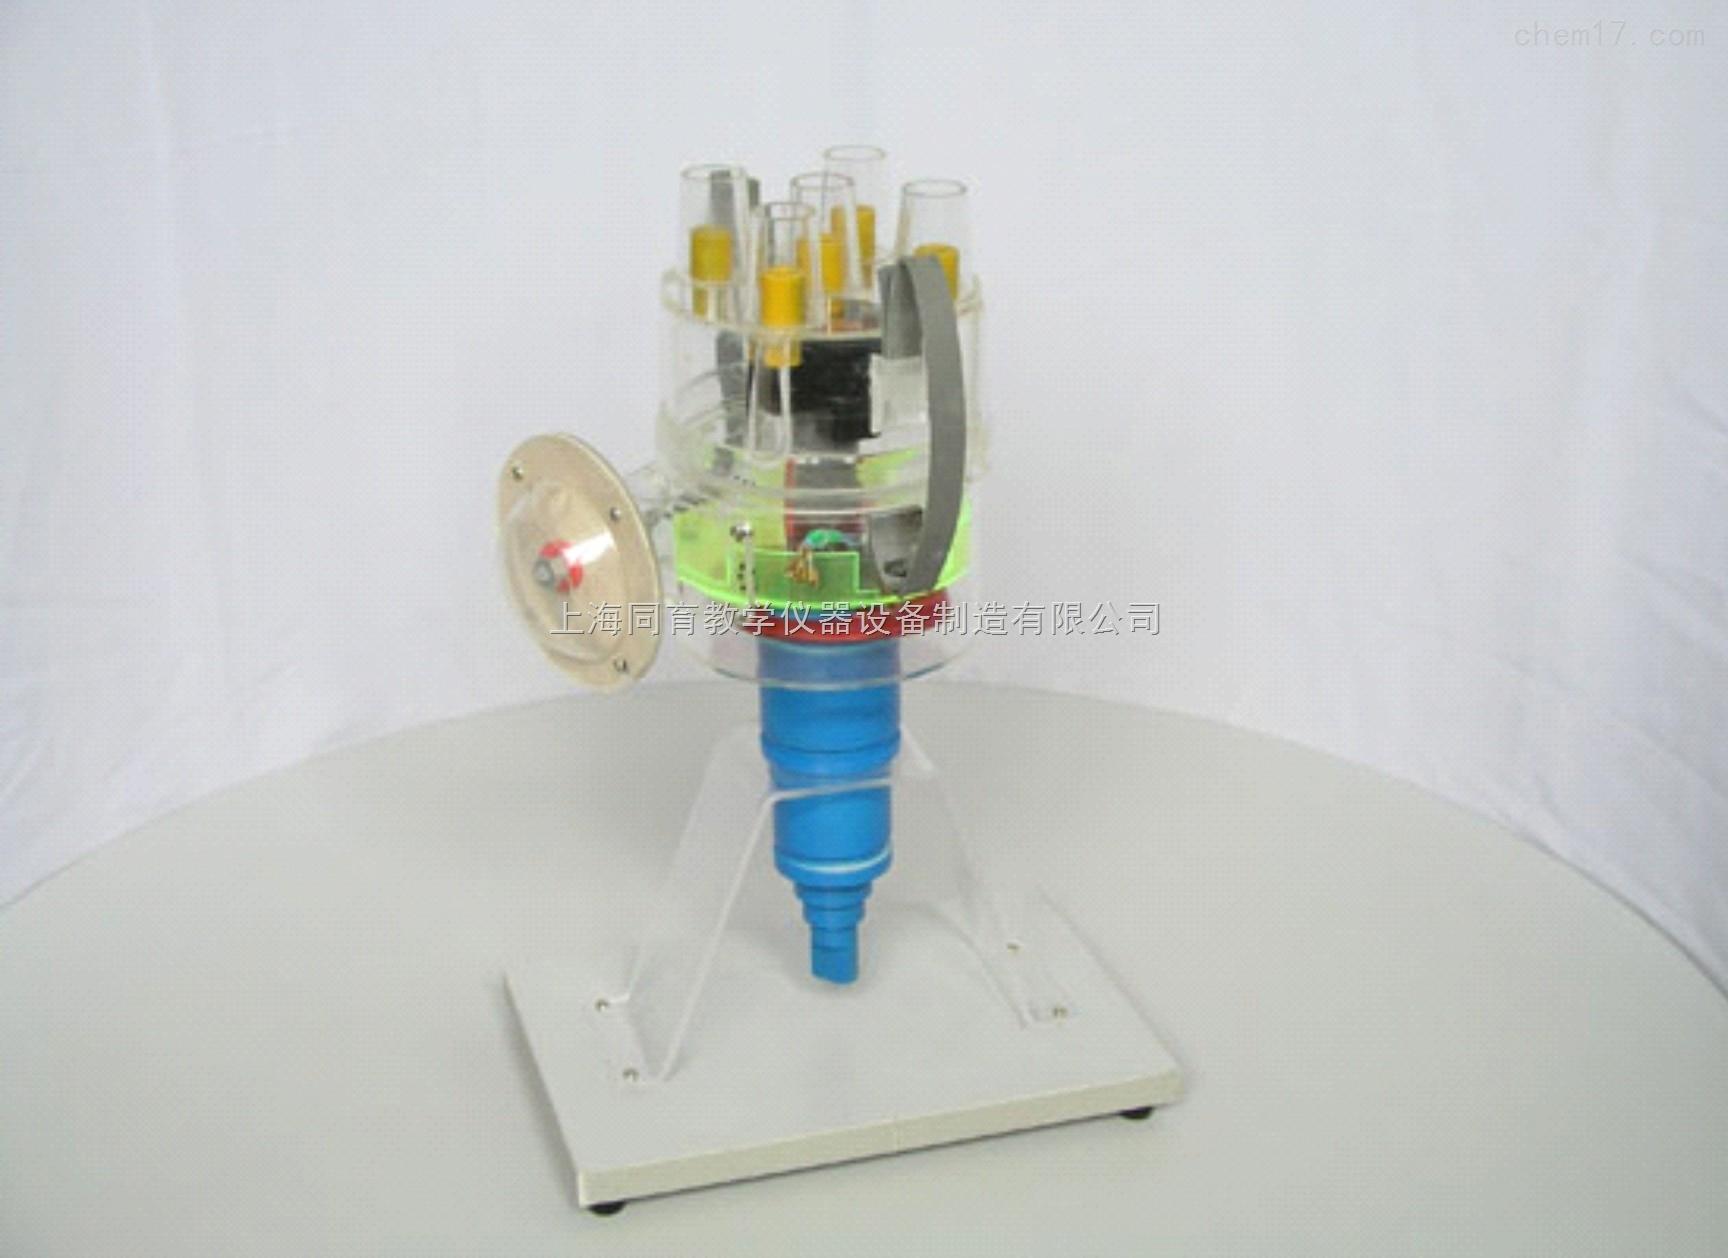 tytep-桑塔纳分电器模型 汽车教学设备